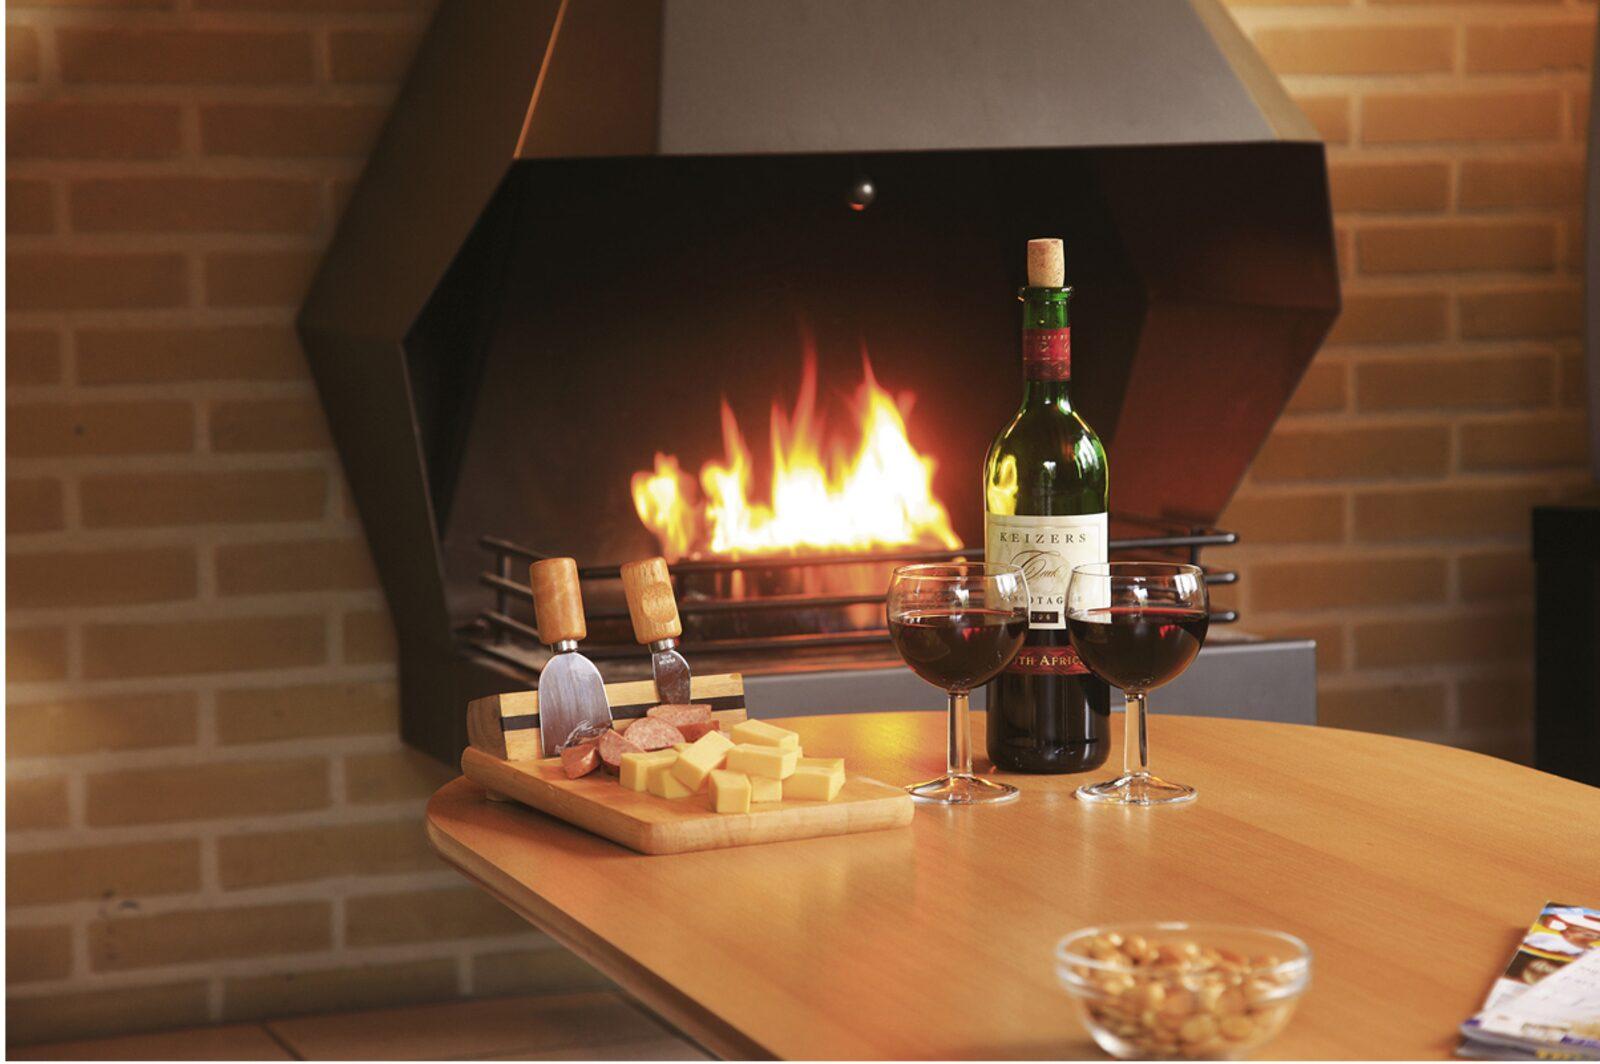 Fireplace blocks